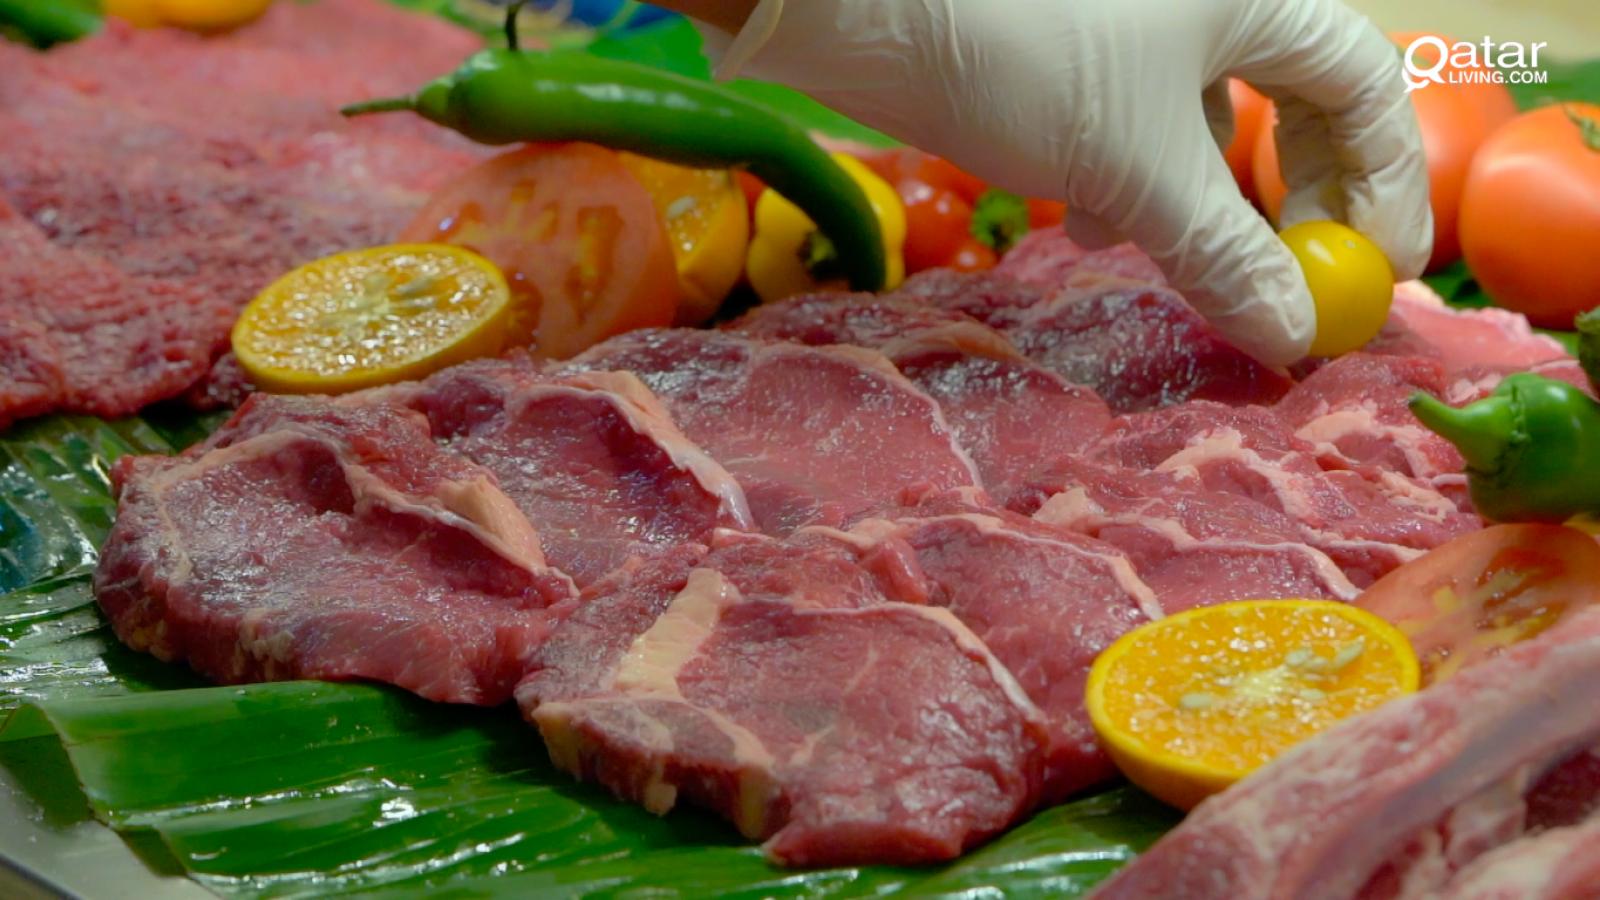 WATCH: Indulge in a scrumptious BBQ feast at Al Baraha